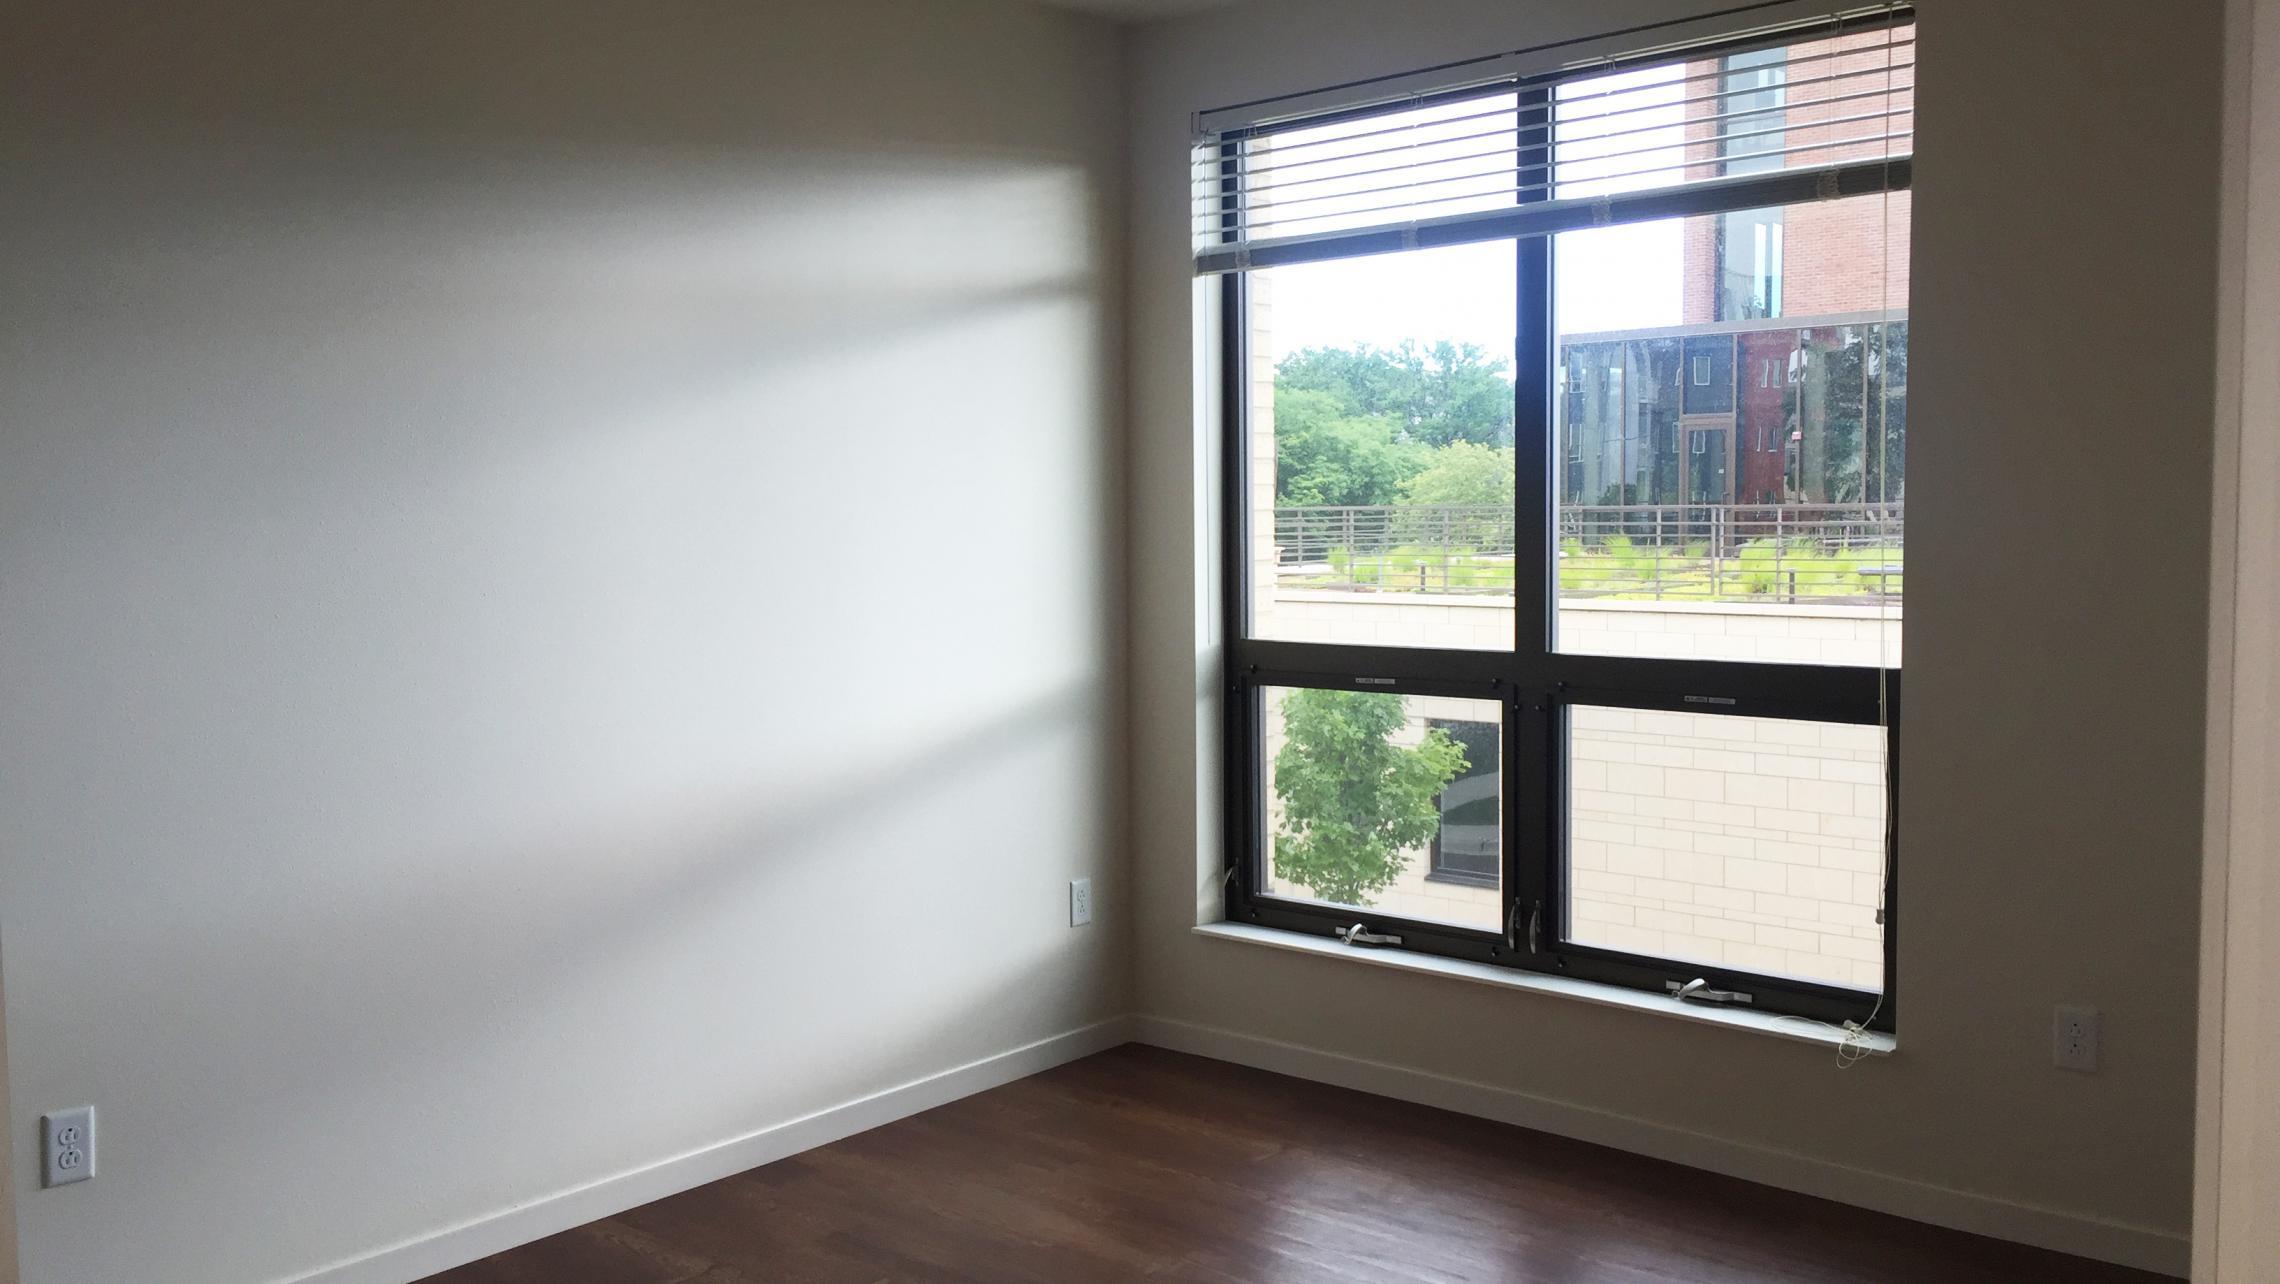 ULI Nine Line Apartment 205 - Bedroom Window